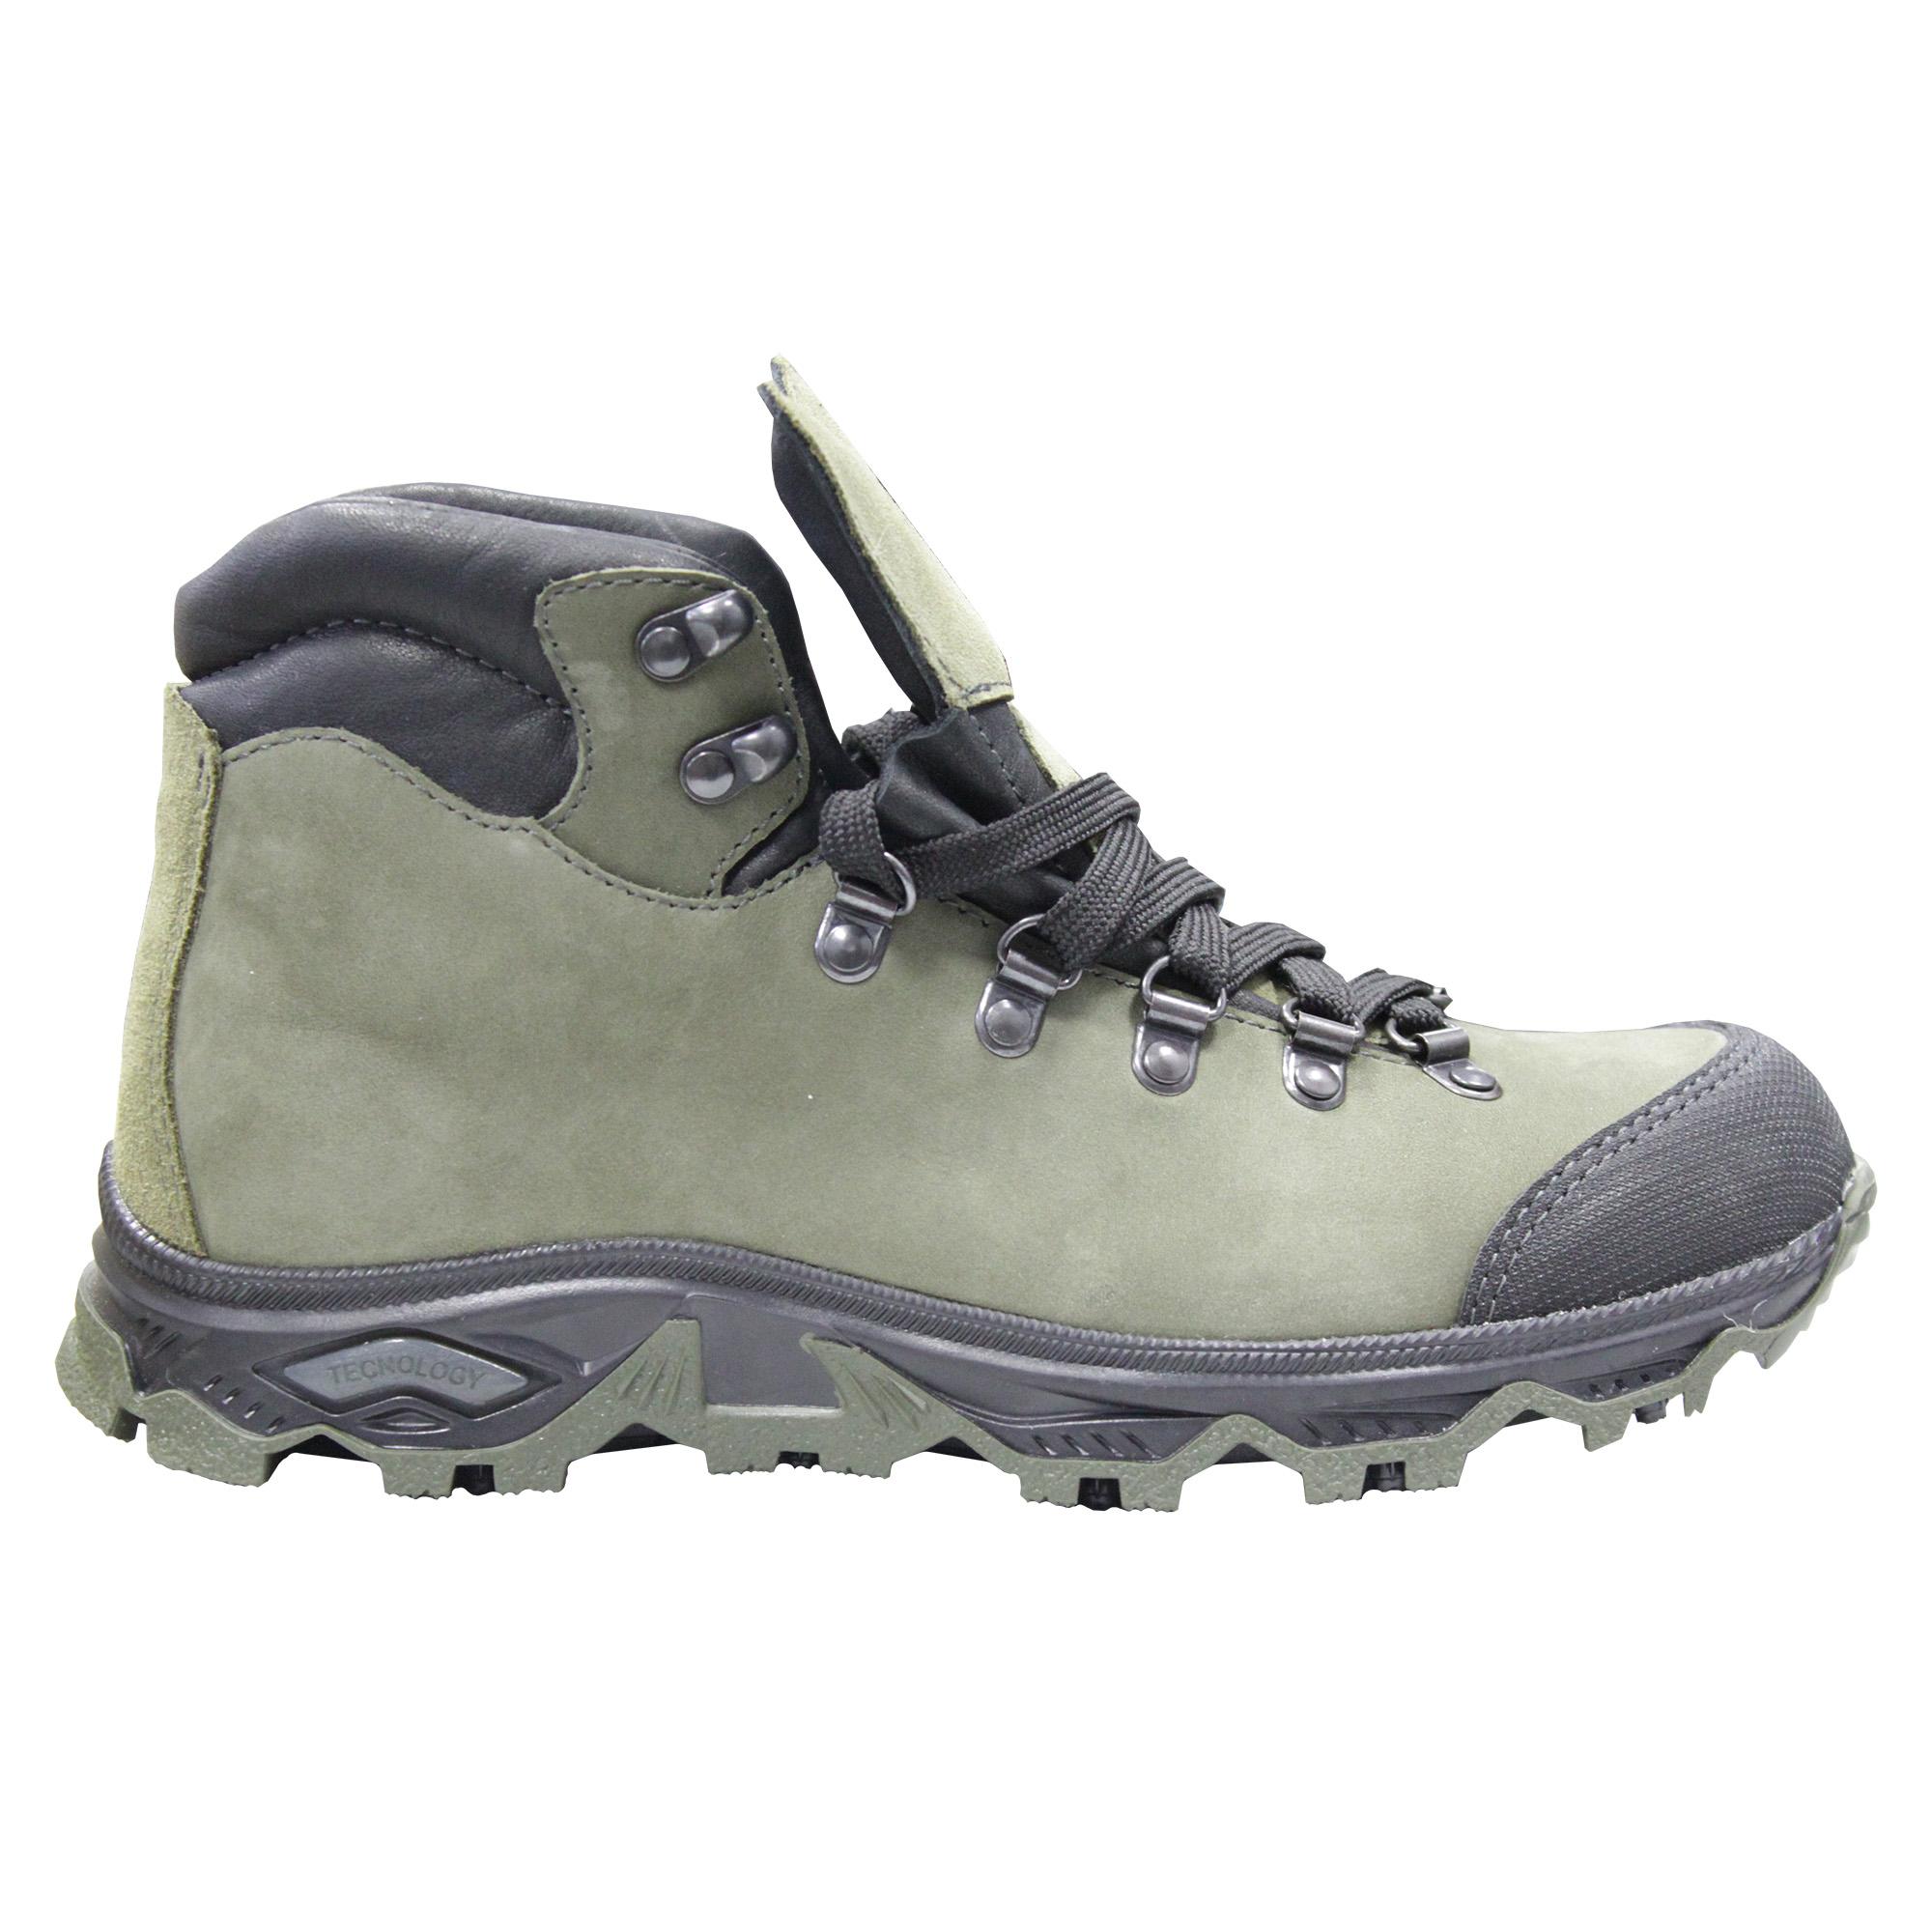 Купить Ботинки TREK Fiord10 (капровелюр), Обувная фабрика Trek